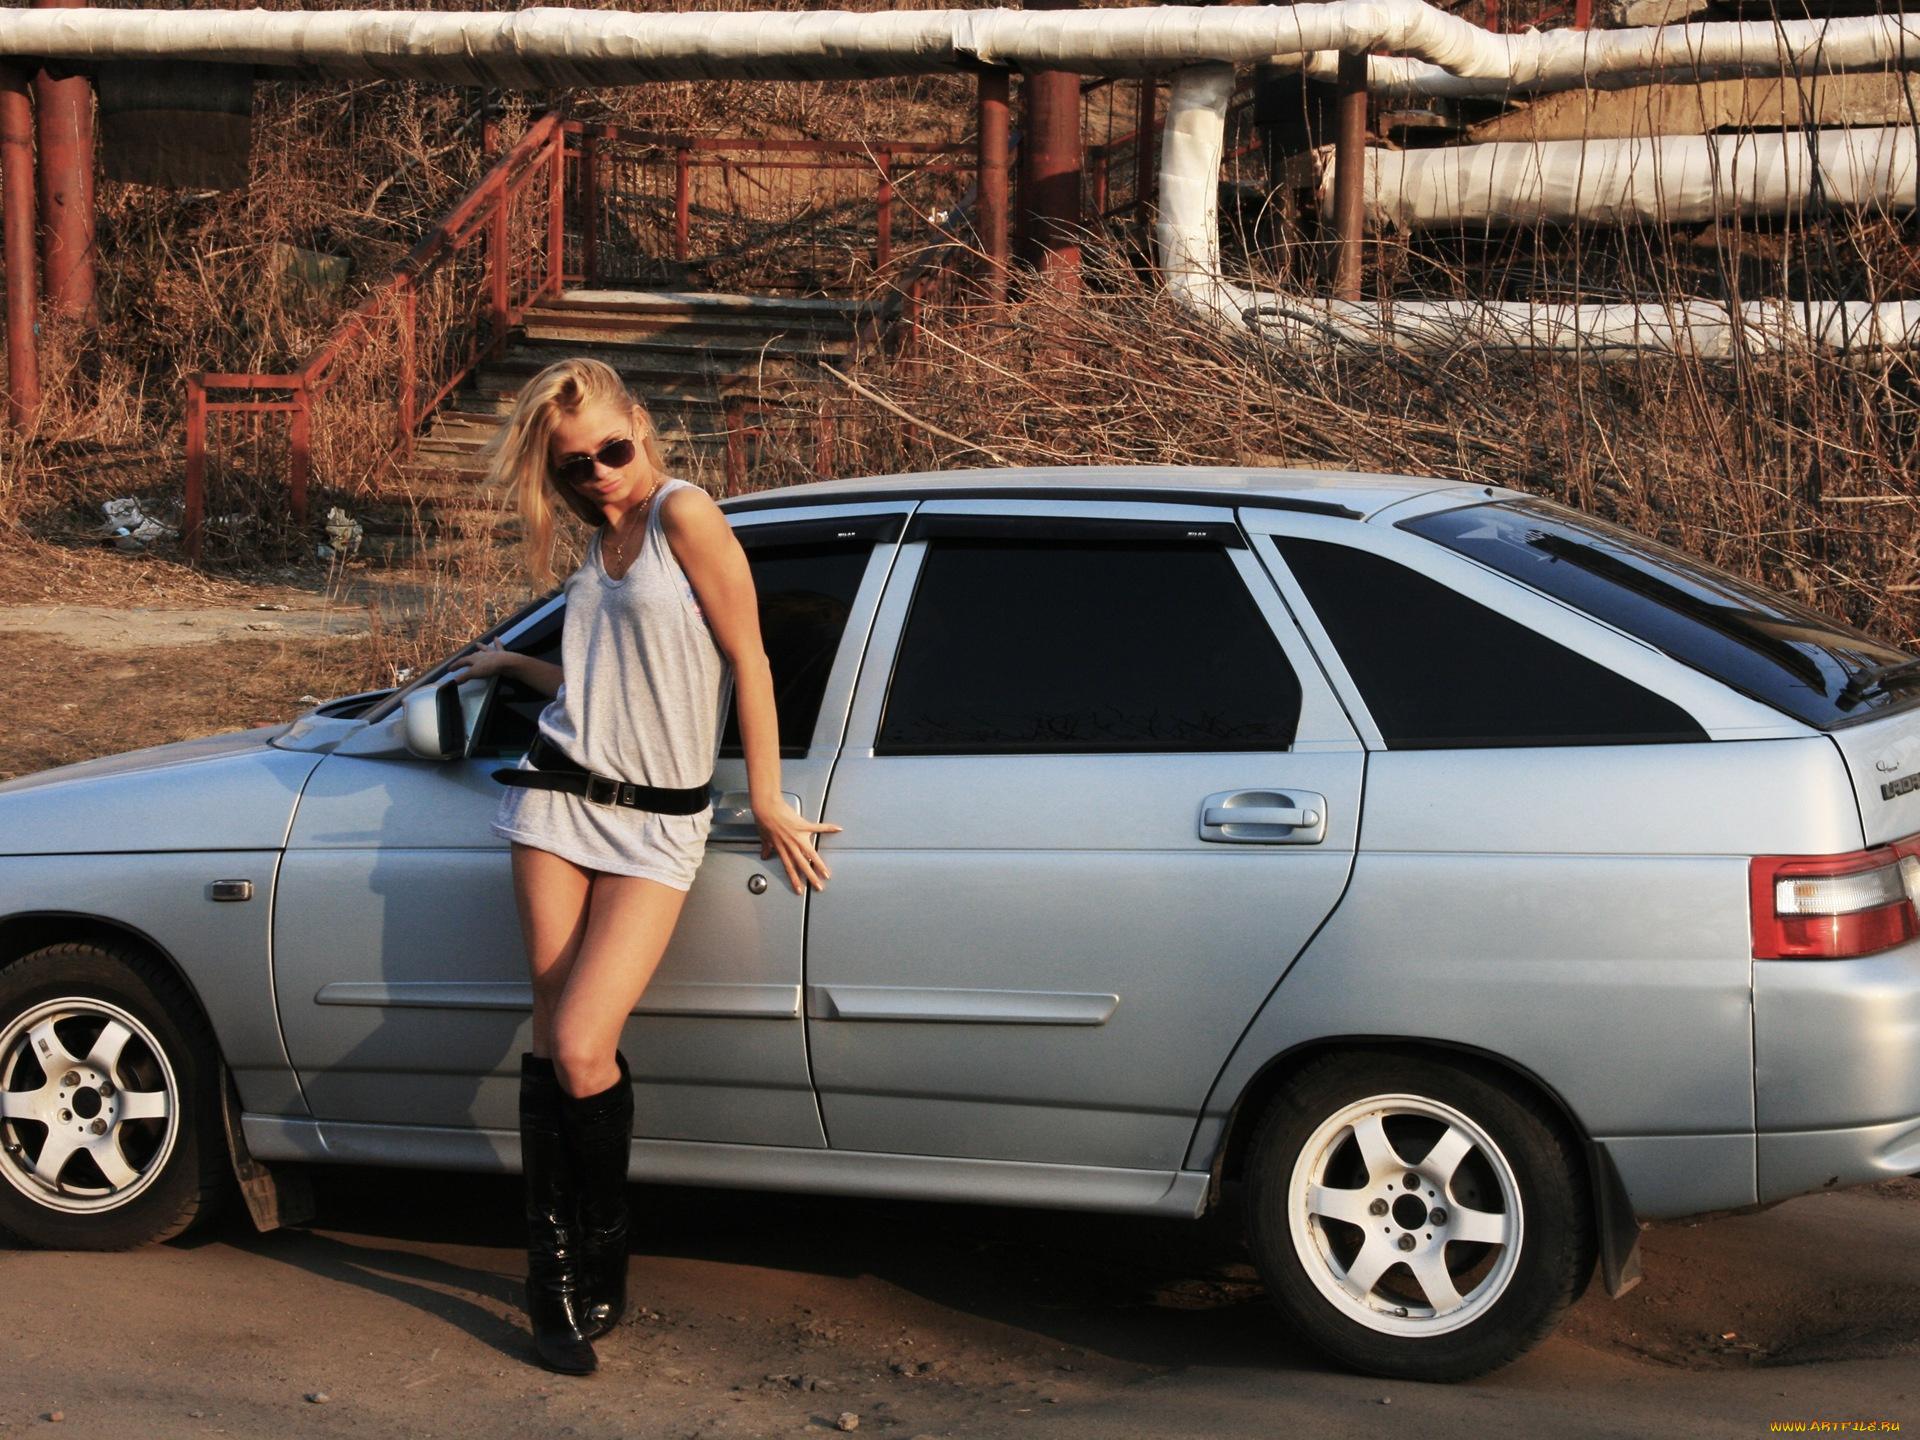 Фото голые девушки и ваз, Ваз и девушки ВКонтакте 22 фотография